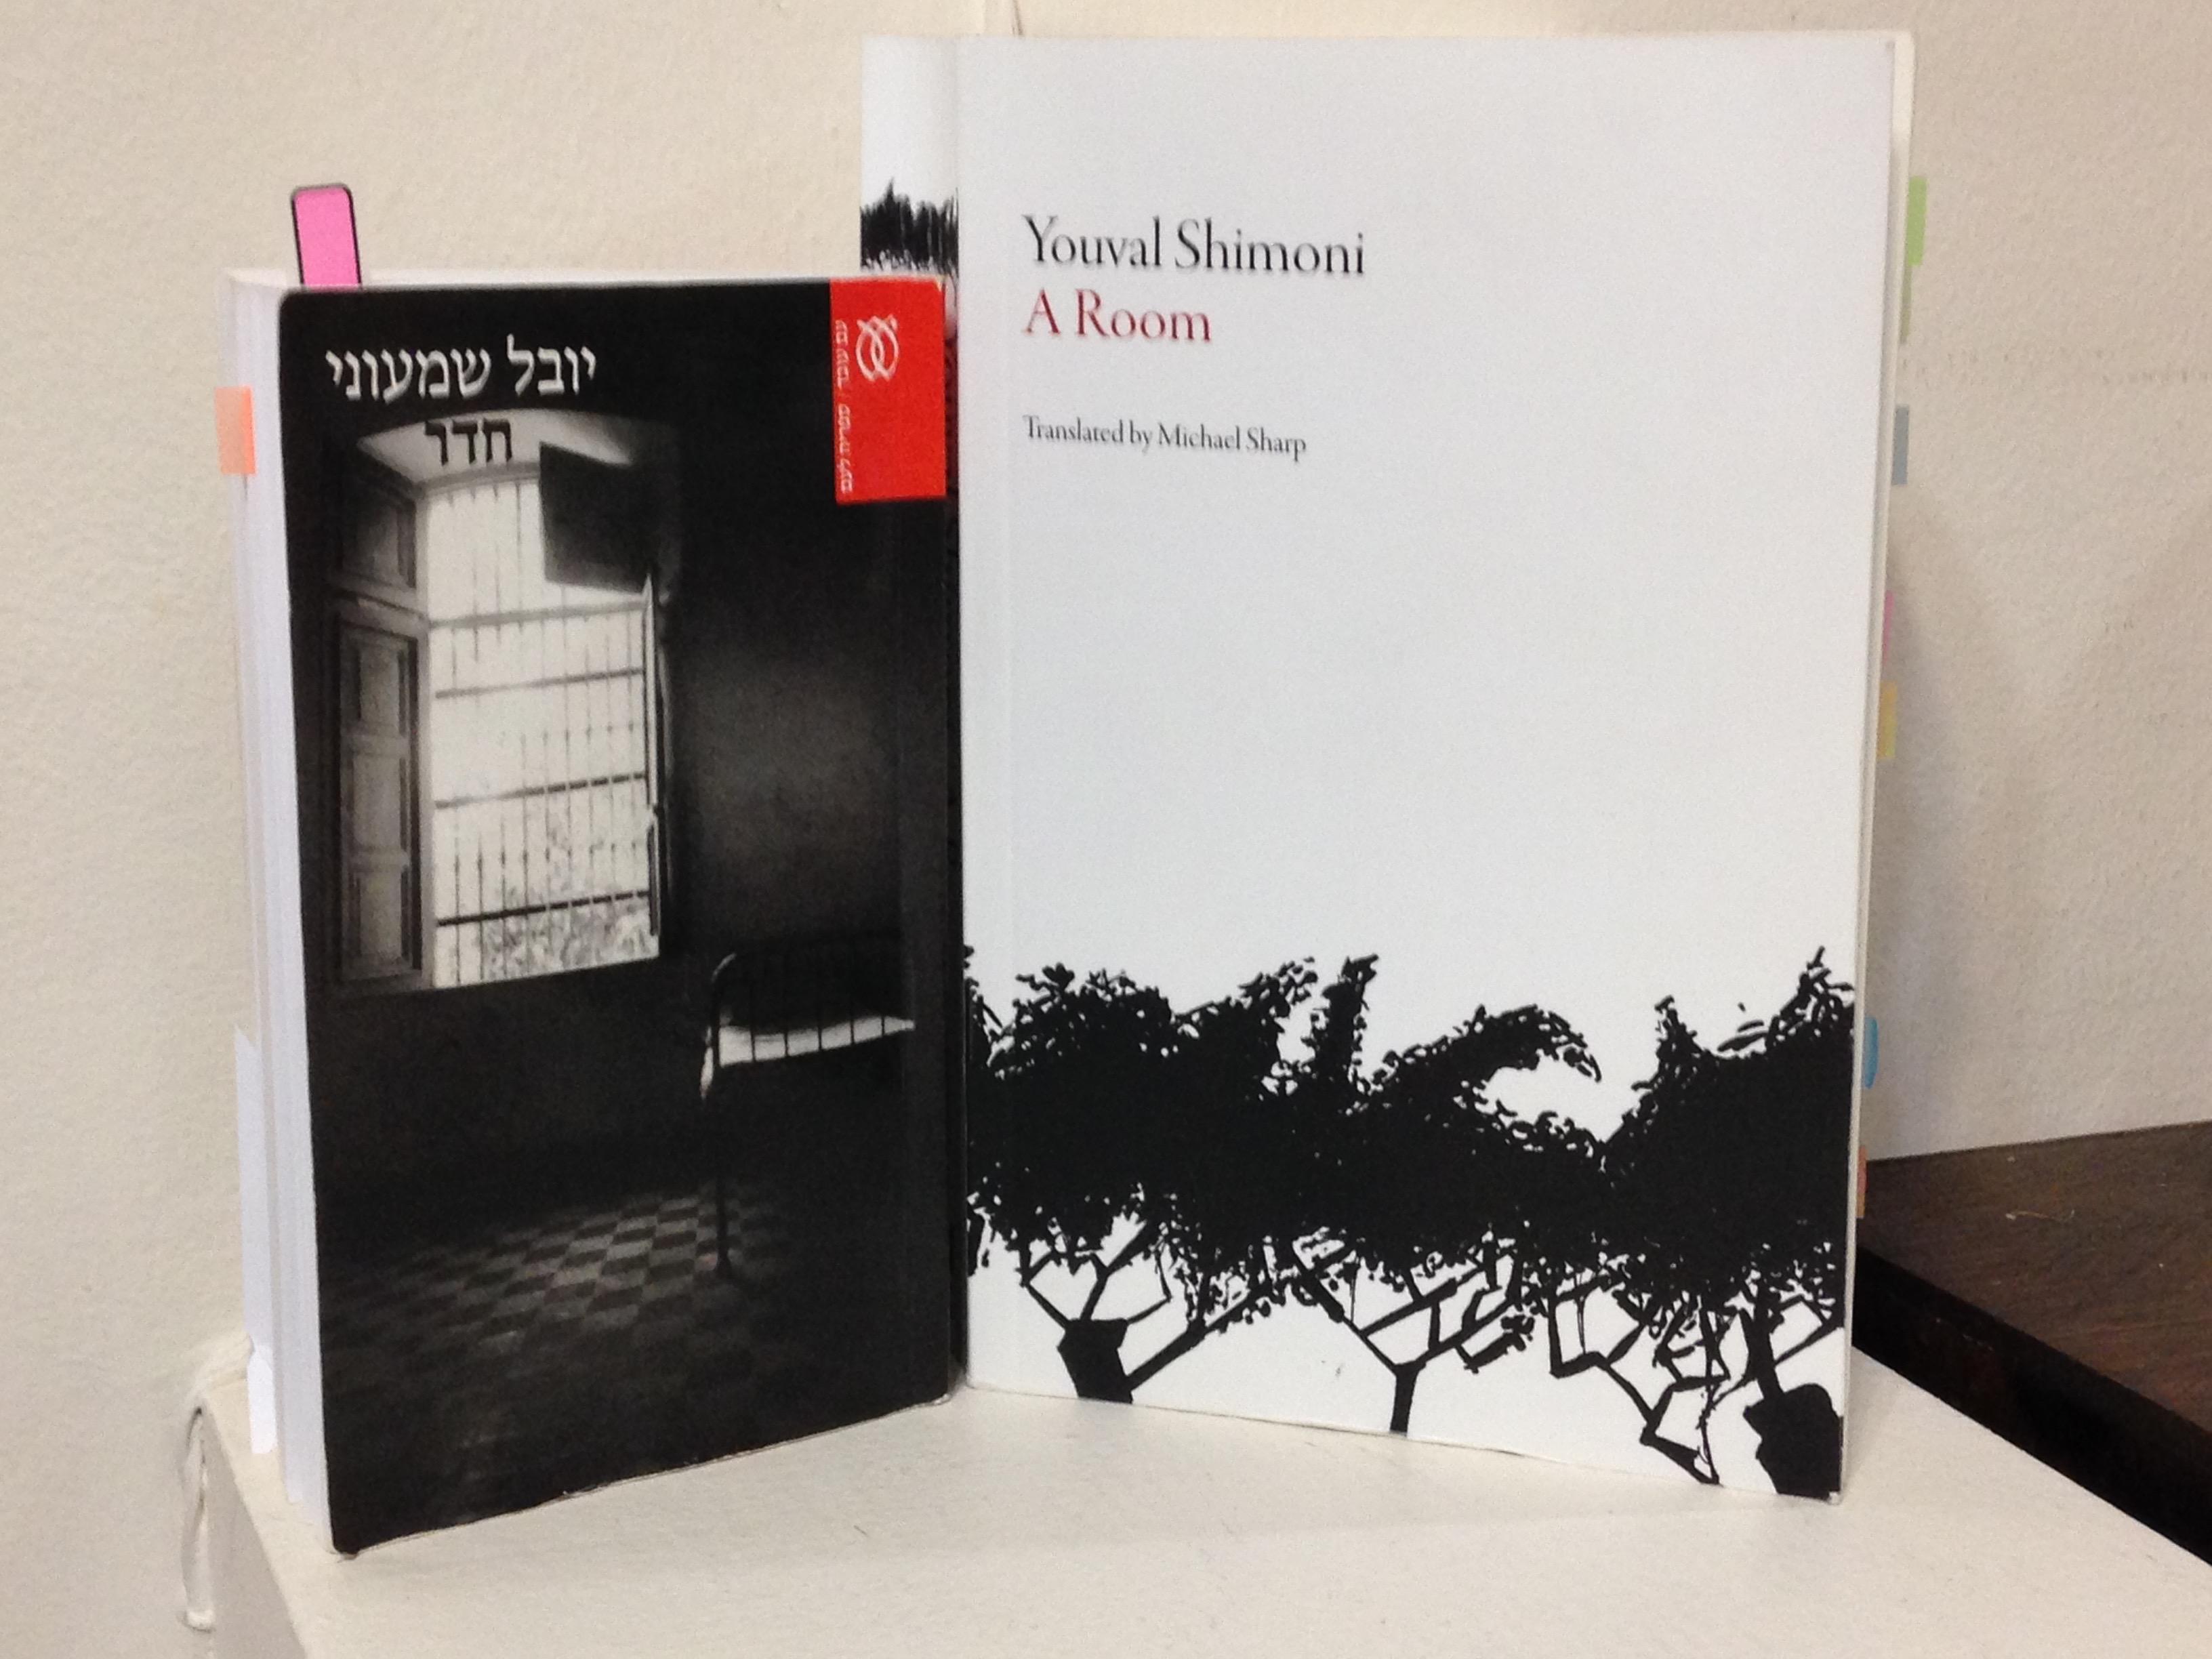 ARoombookcovers